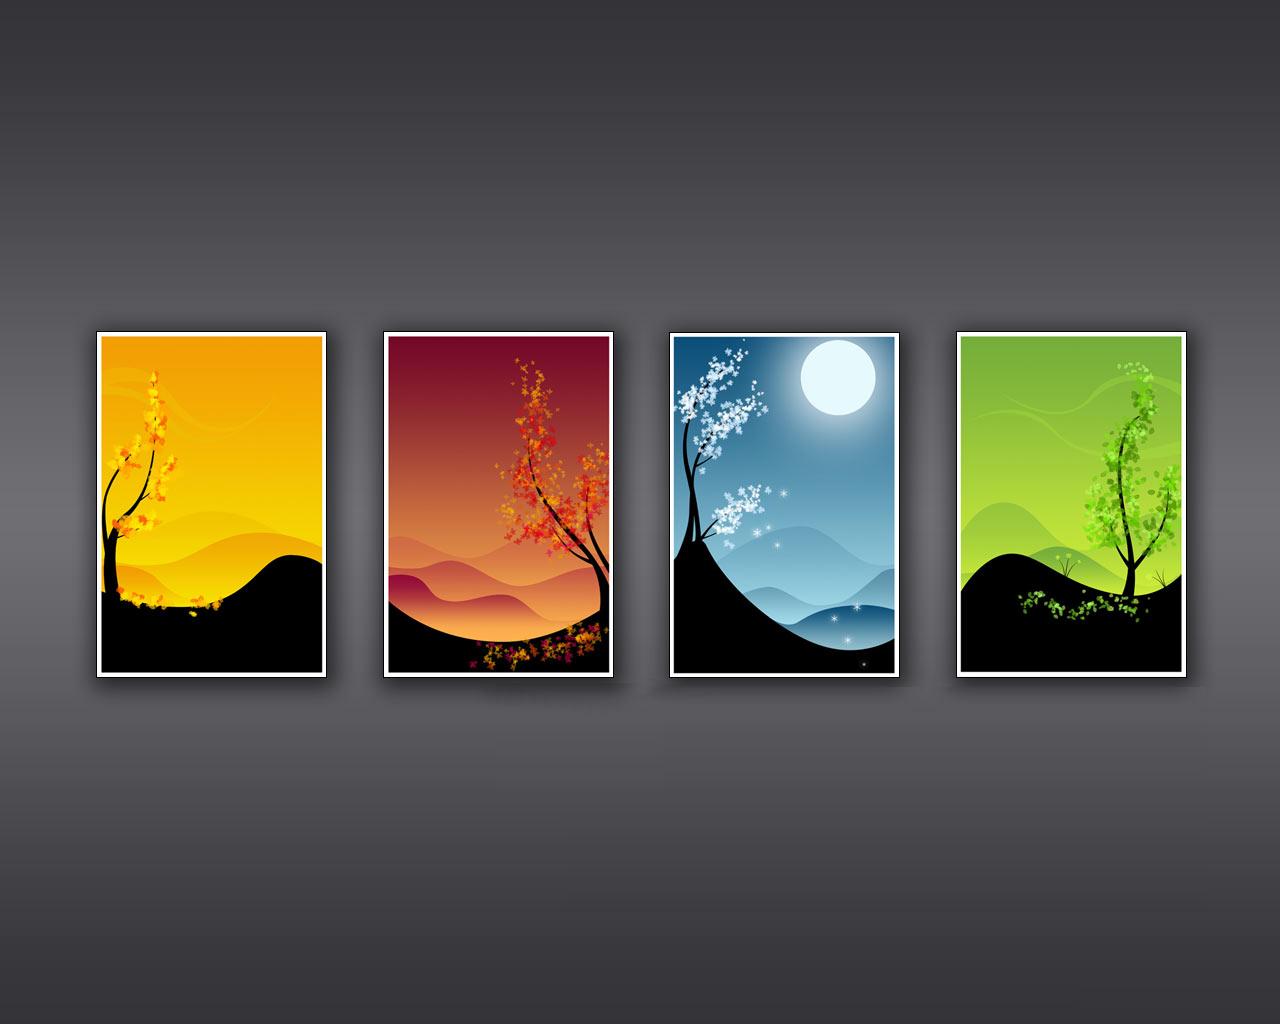 http://3.bp.blogspot.com/_mxi0tpwMGtw/S7aQNbhZXsI/AAAAAAAAAMM/K5eizOcZNvk/s1600/Change_of_Seasons_Carbon.jpg